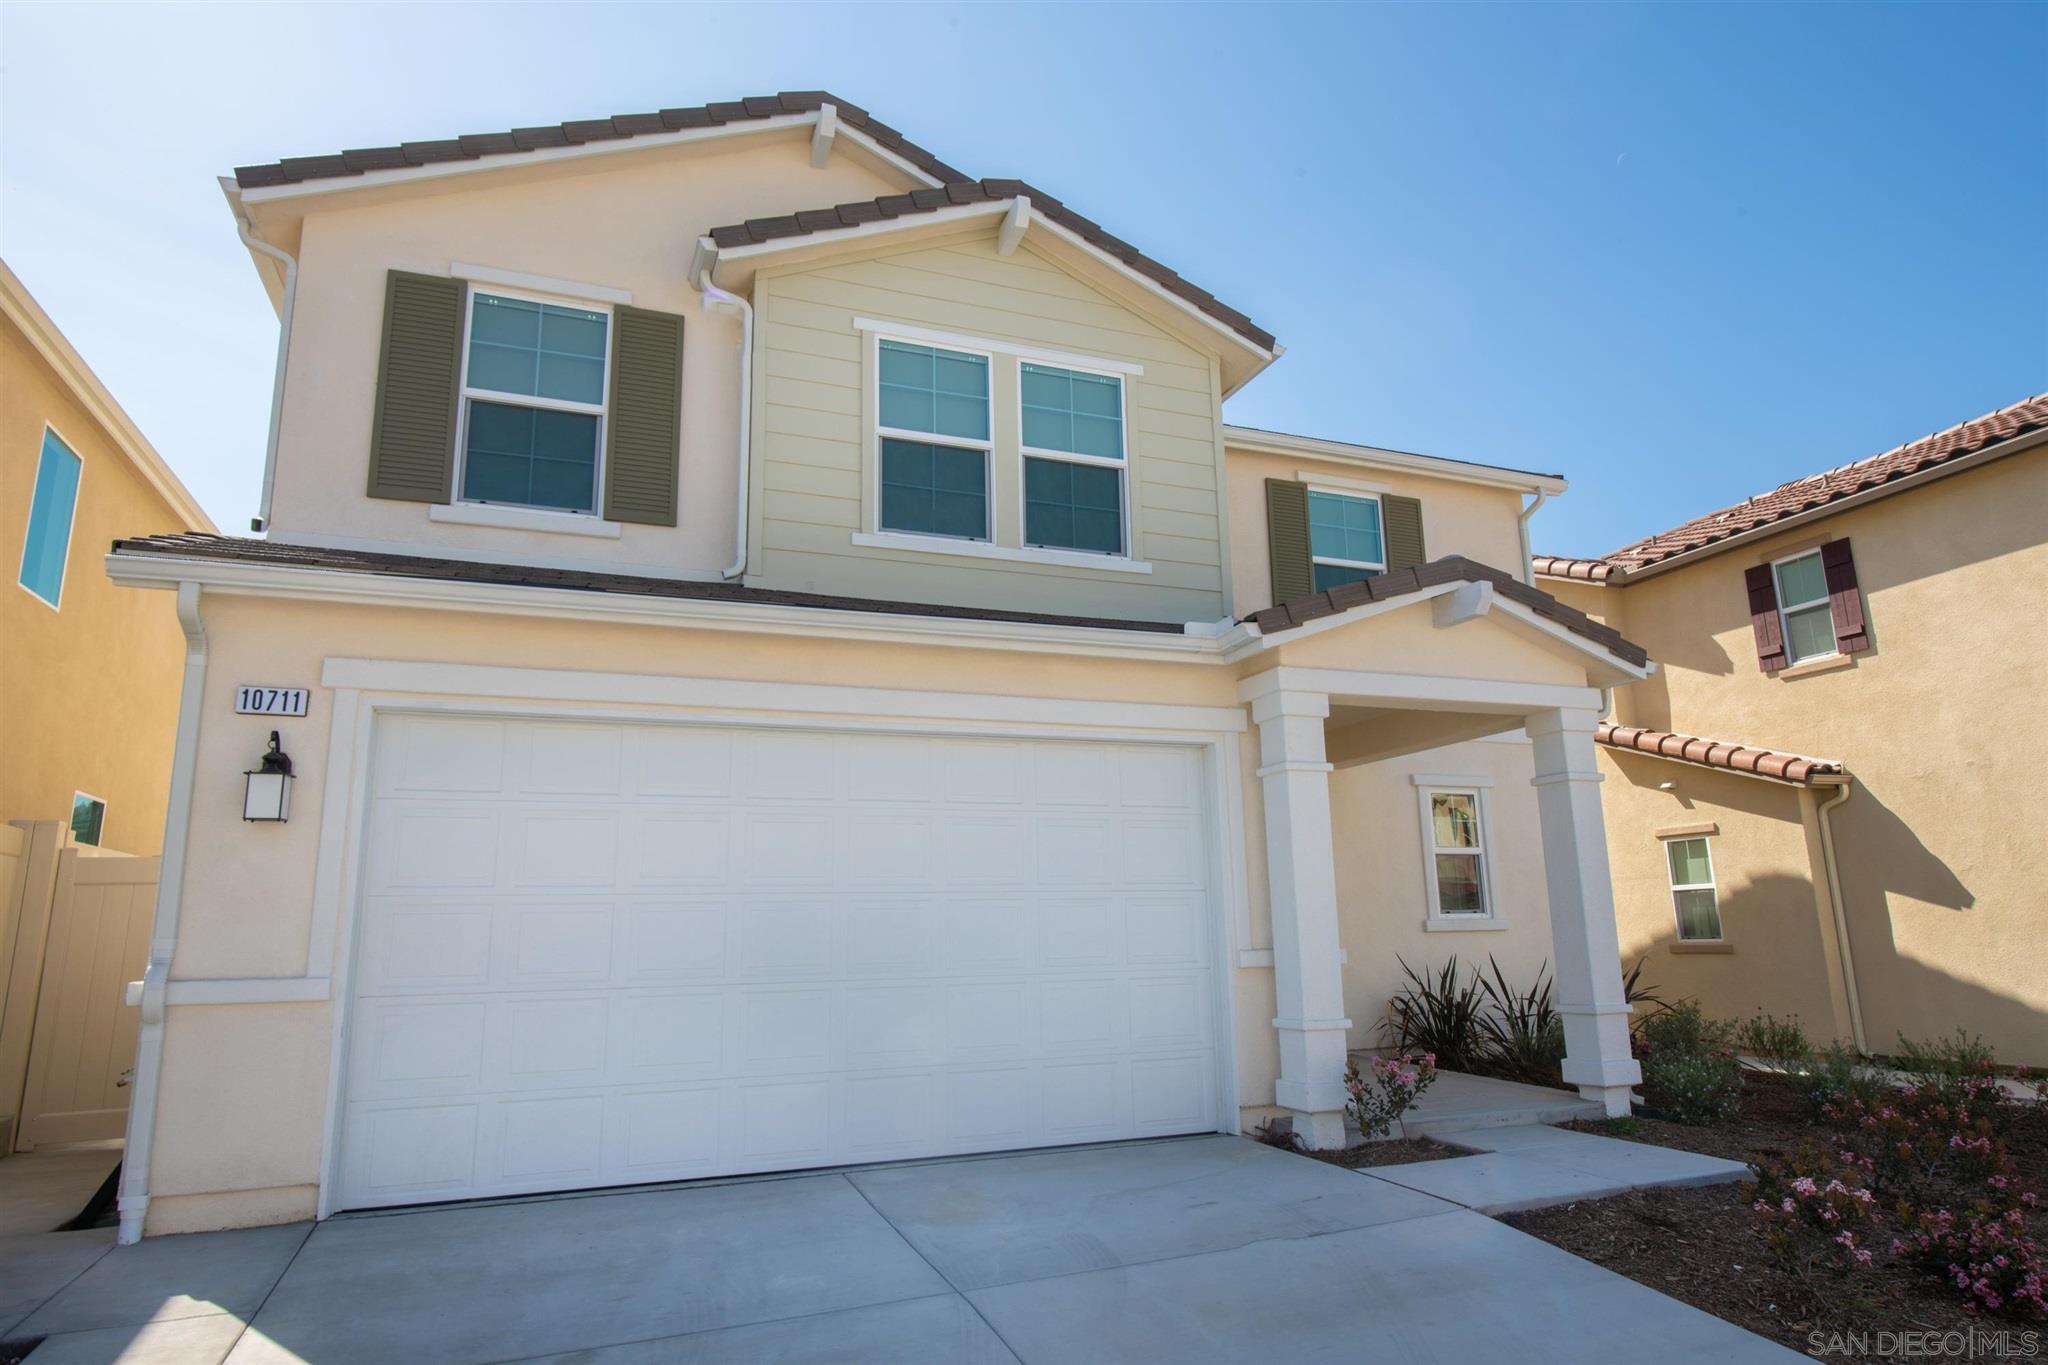 10711 Porter Terr, Spring Valley, CA 91978